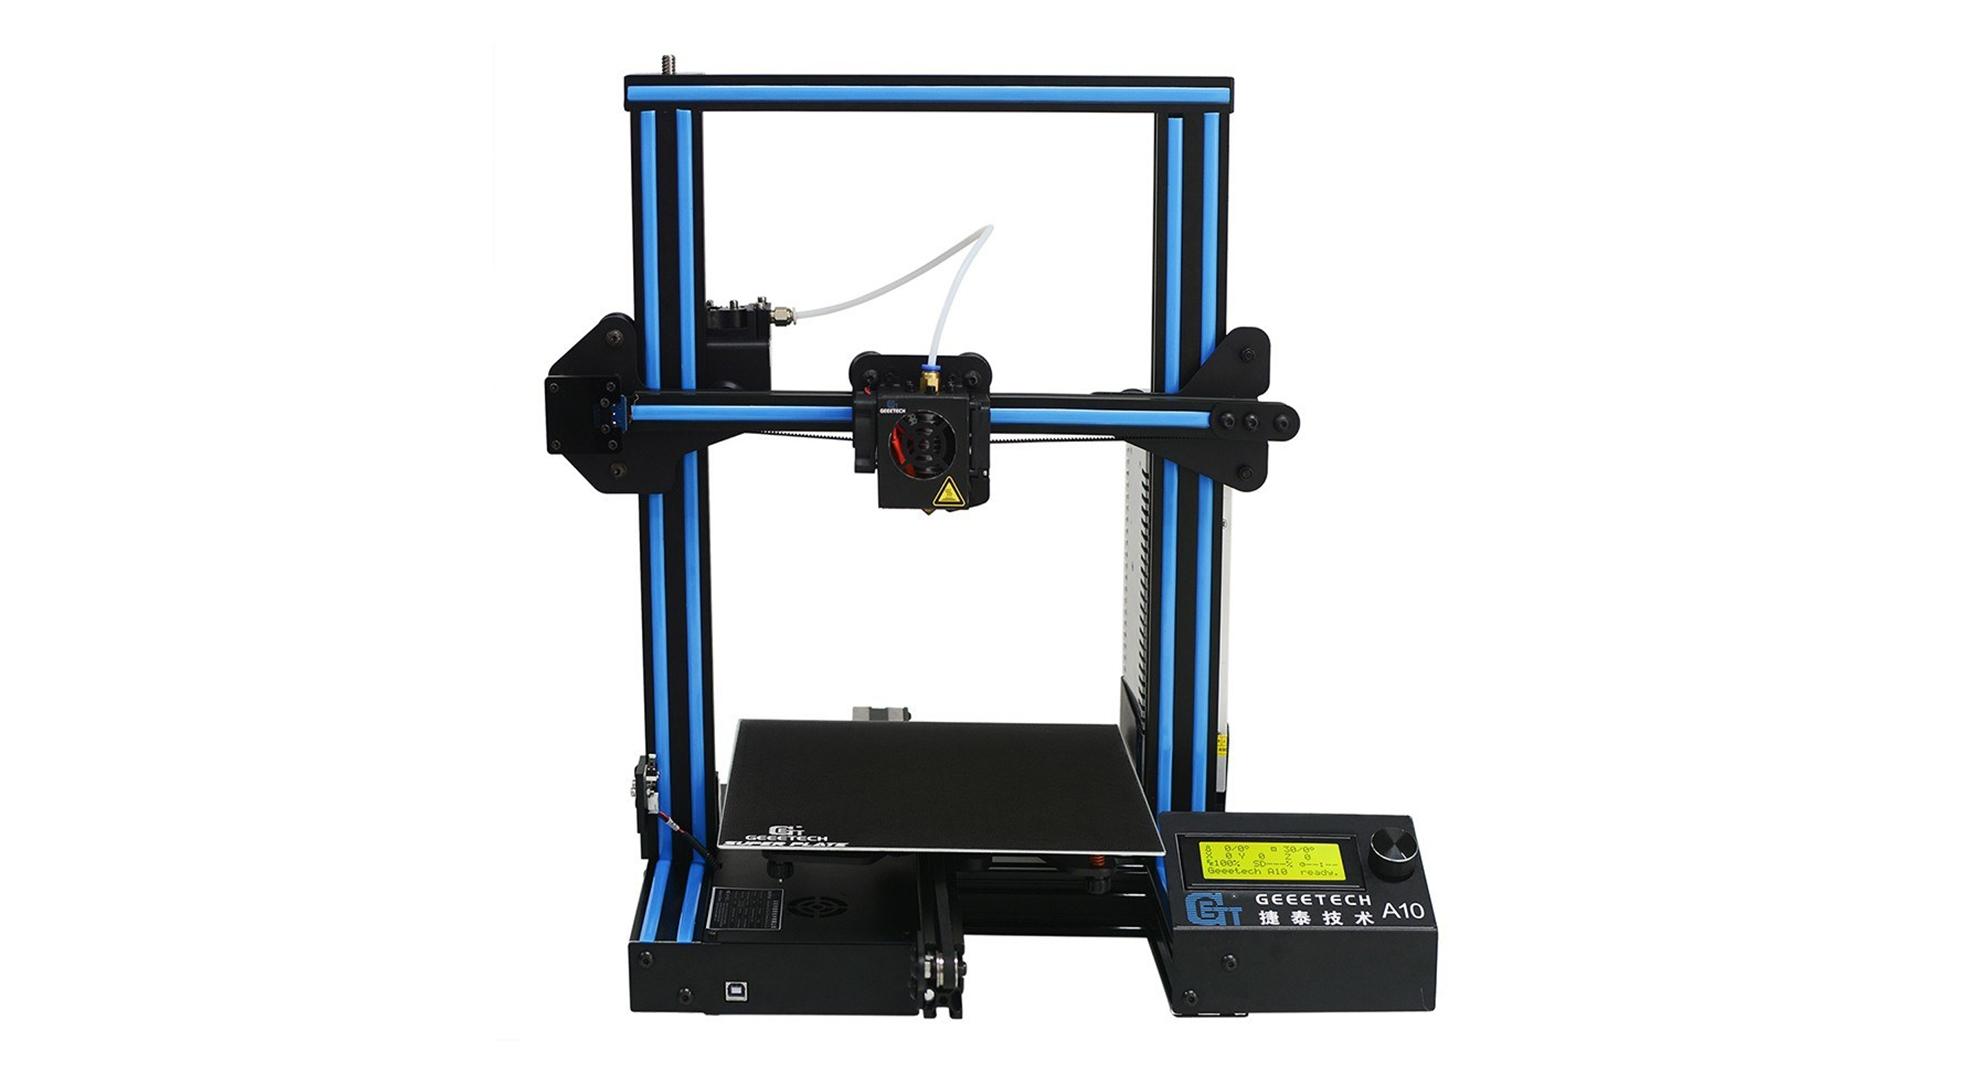 Geeetech A10 je úžasná 3D tiskárna za pakatel! [sponzorovaný článek]